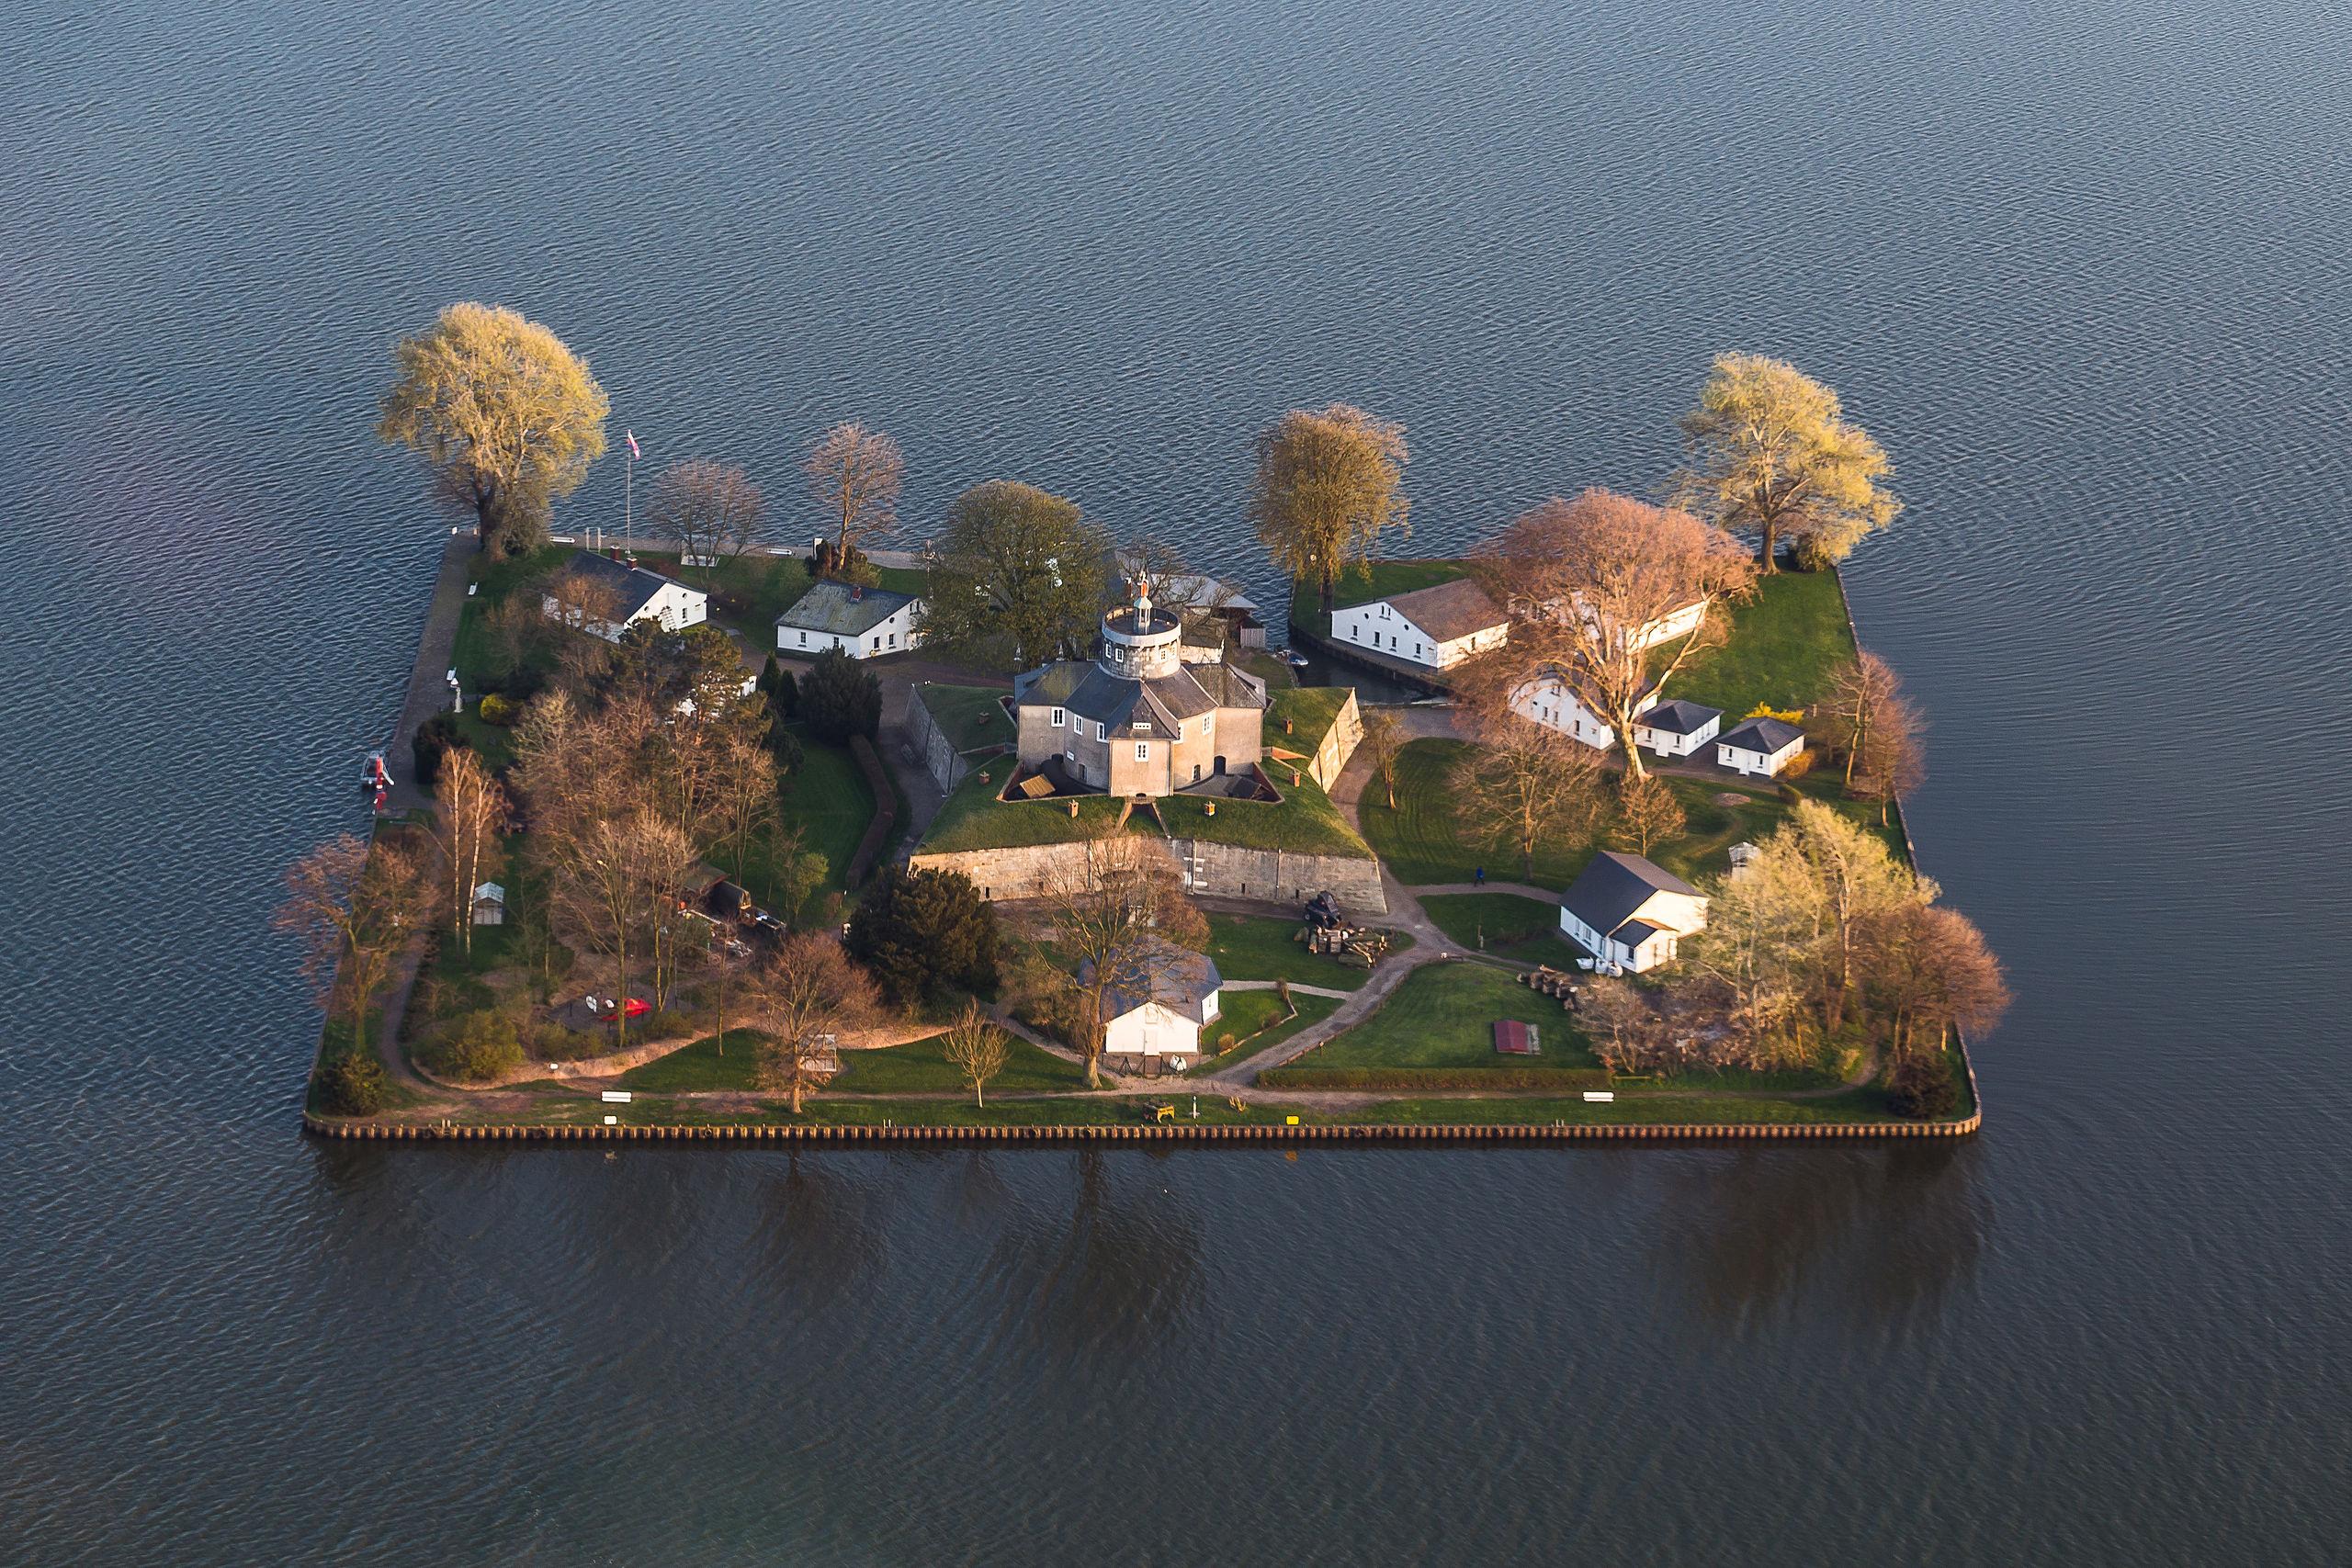 Wilhelmstein, a tiny military island, near Hannover, Germany